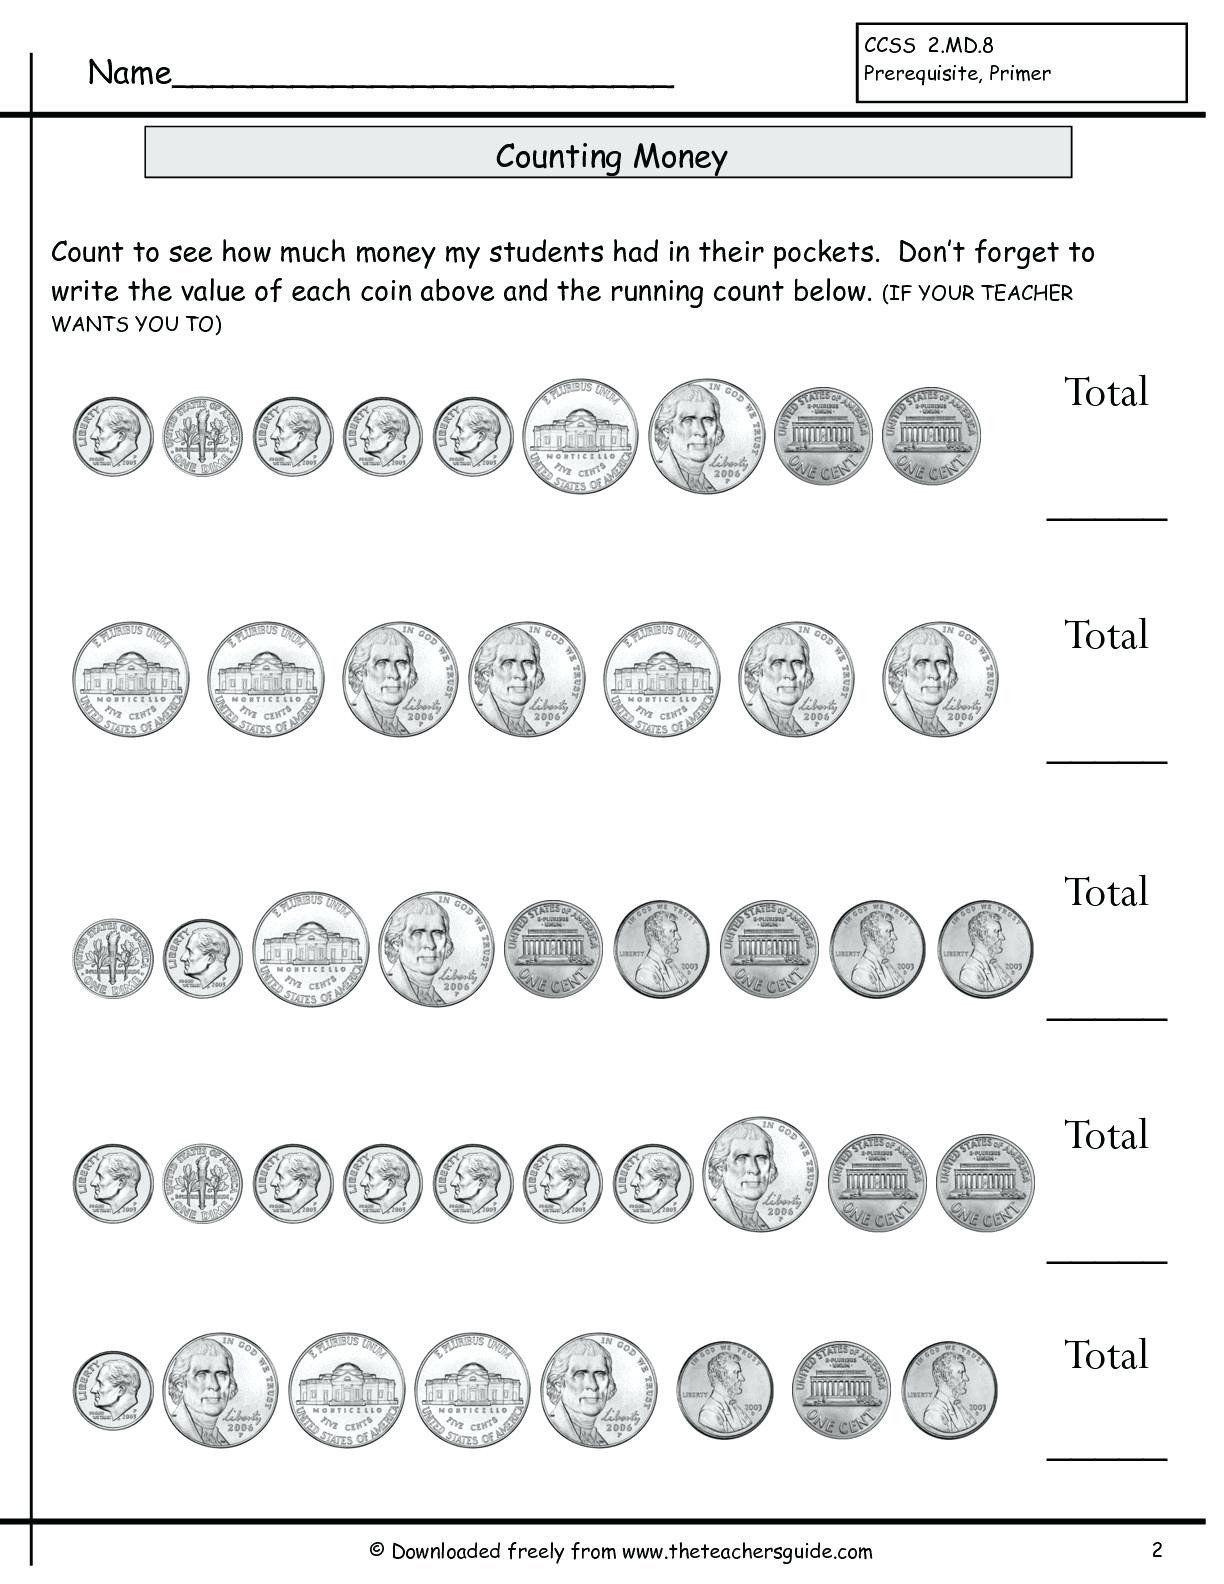 Nickel Worksheets For Kindergarten Count Coins Worksheet Counting Money Bills And Coins In 2020 Money Math Worksheets Counting Money Worksheets Money Worksheets